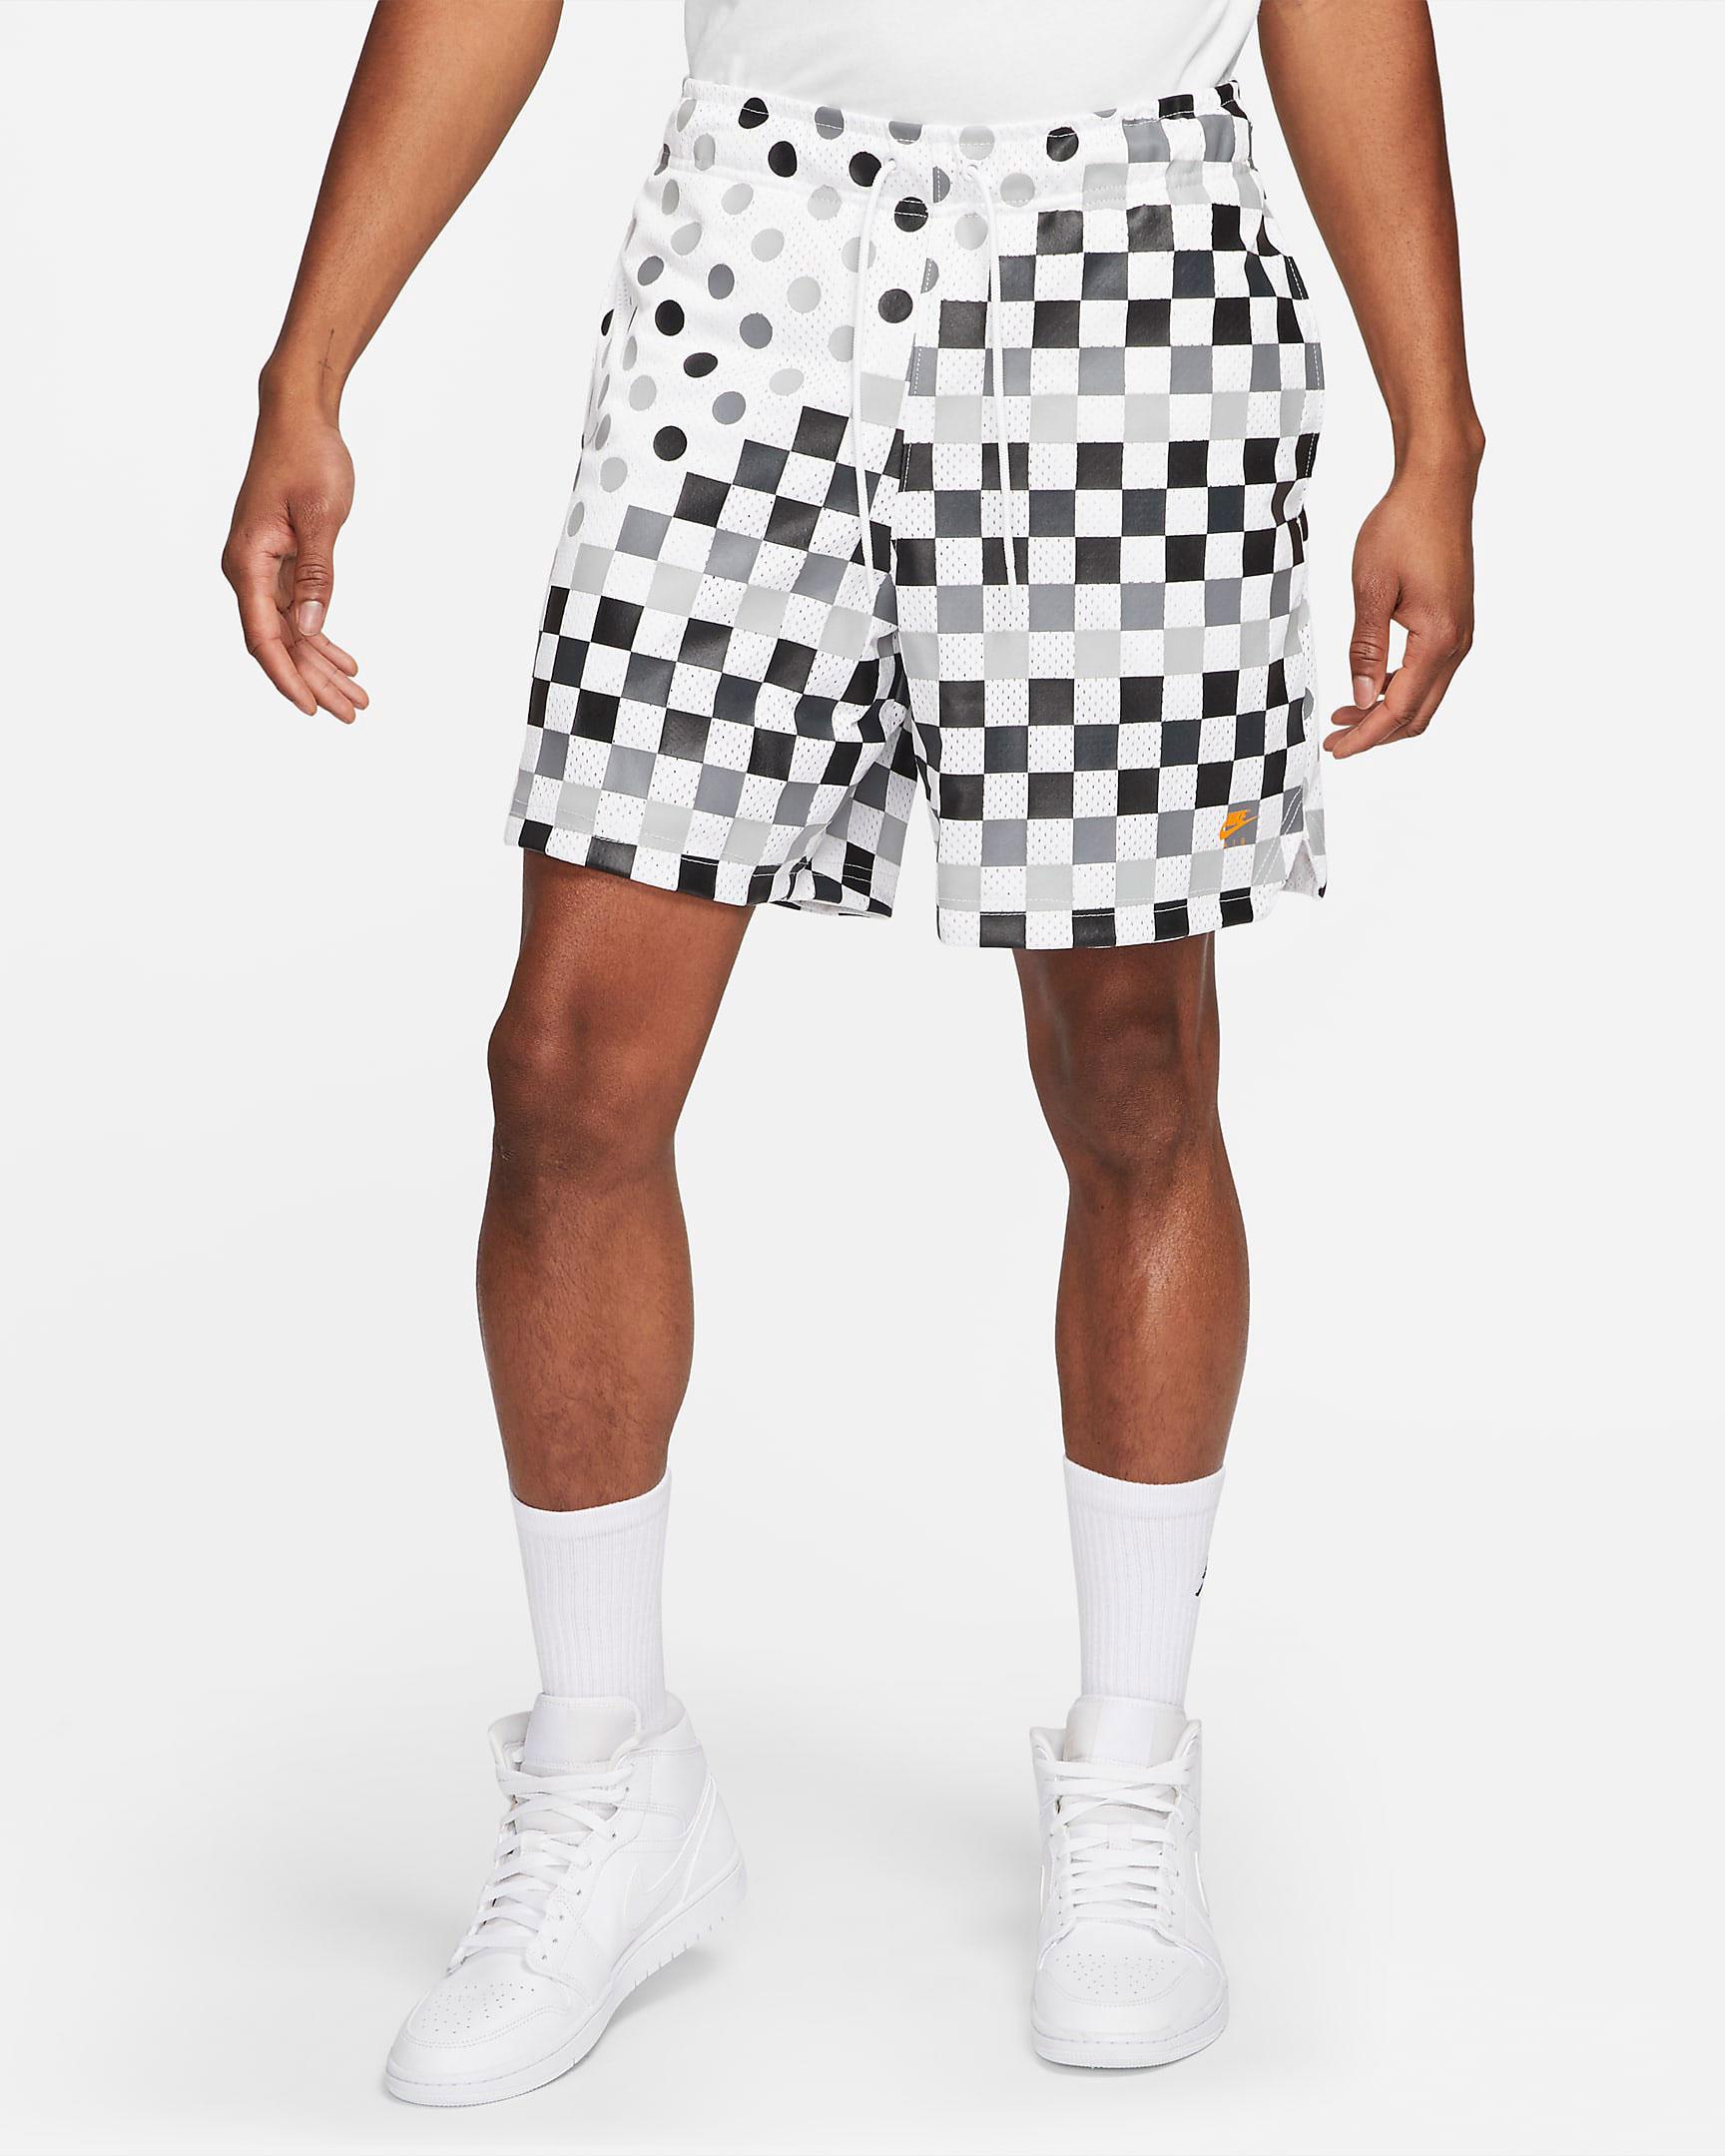 where-to-buy-air-jordan-3-cool-grey-2021-shorts-1